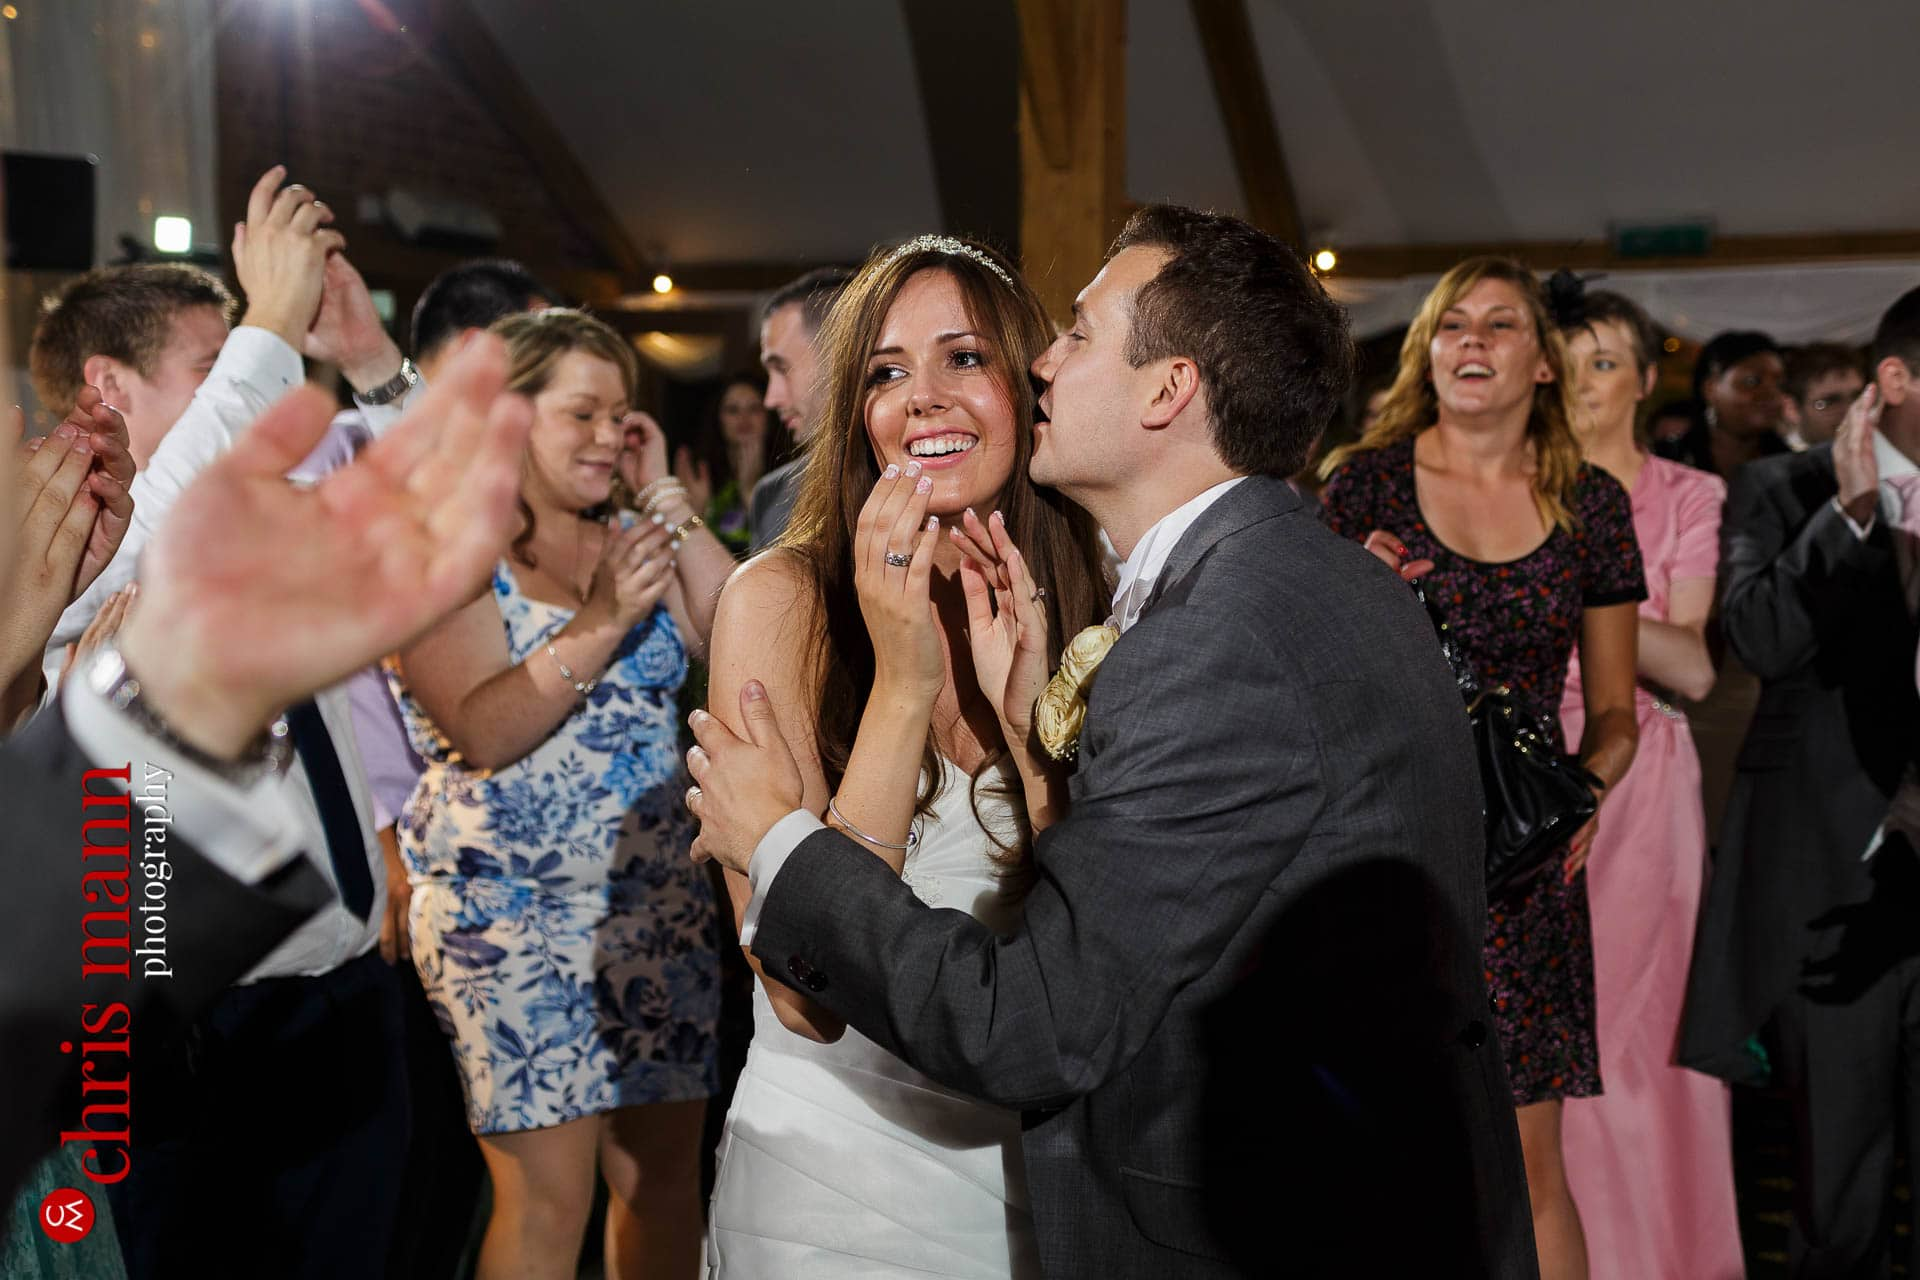 Brocket-Hall-wedding-photography-060